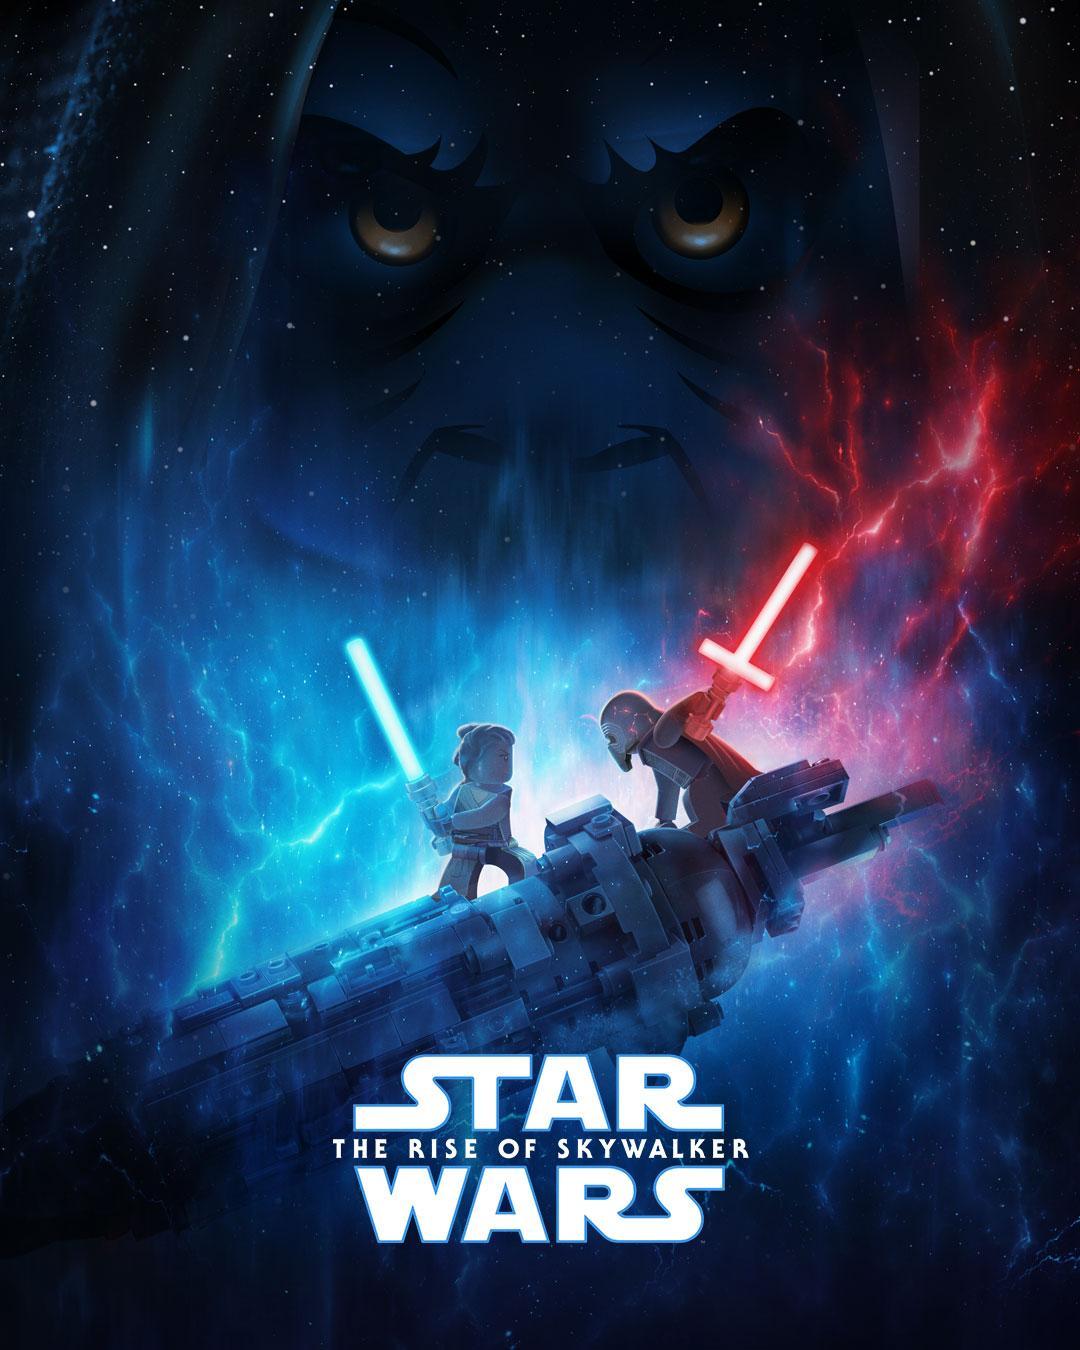 Star Wars Episode Ix The Rise Of Skywalker Brickipedia Fandom